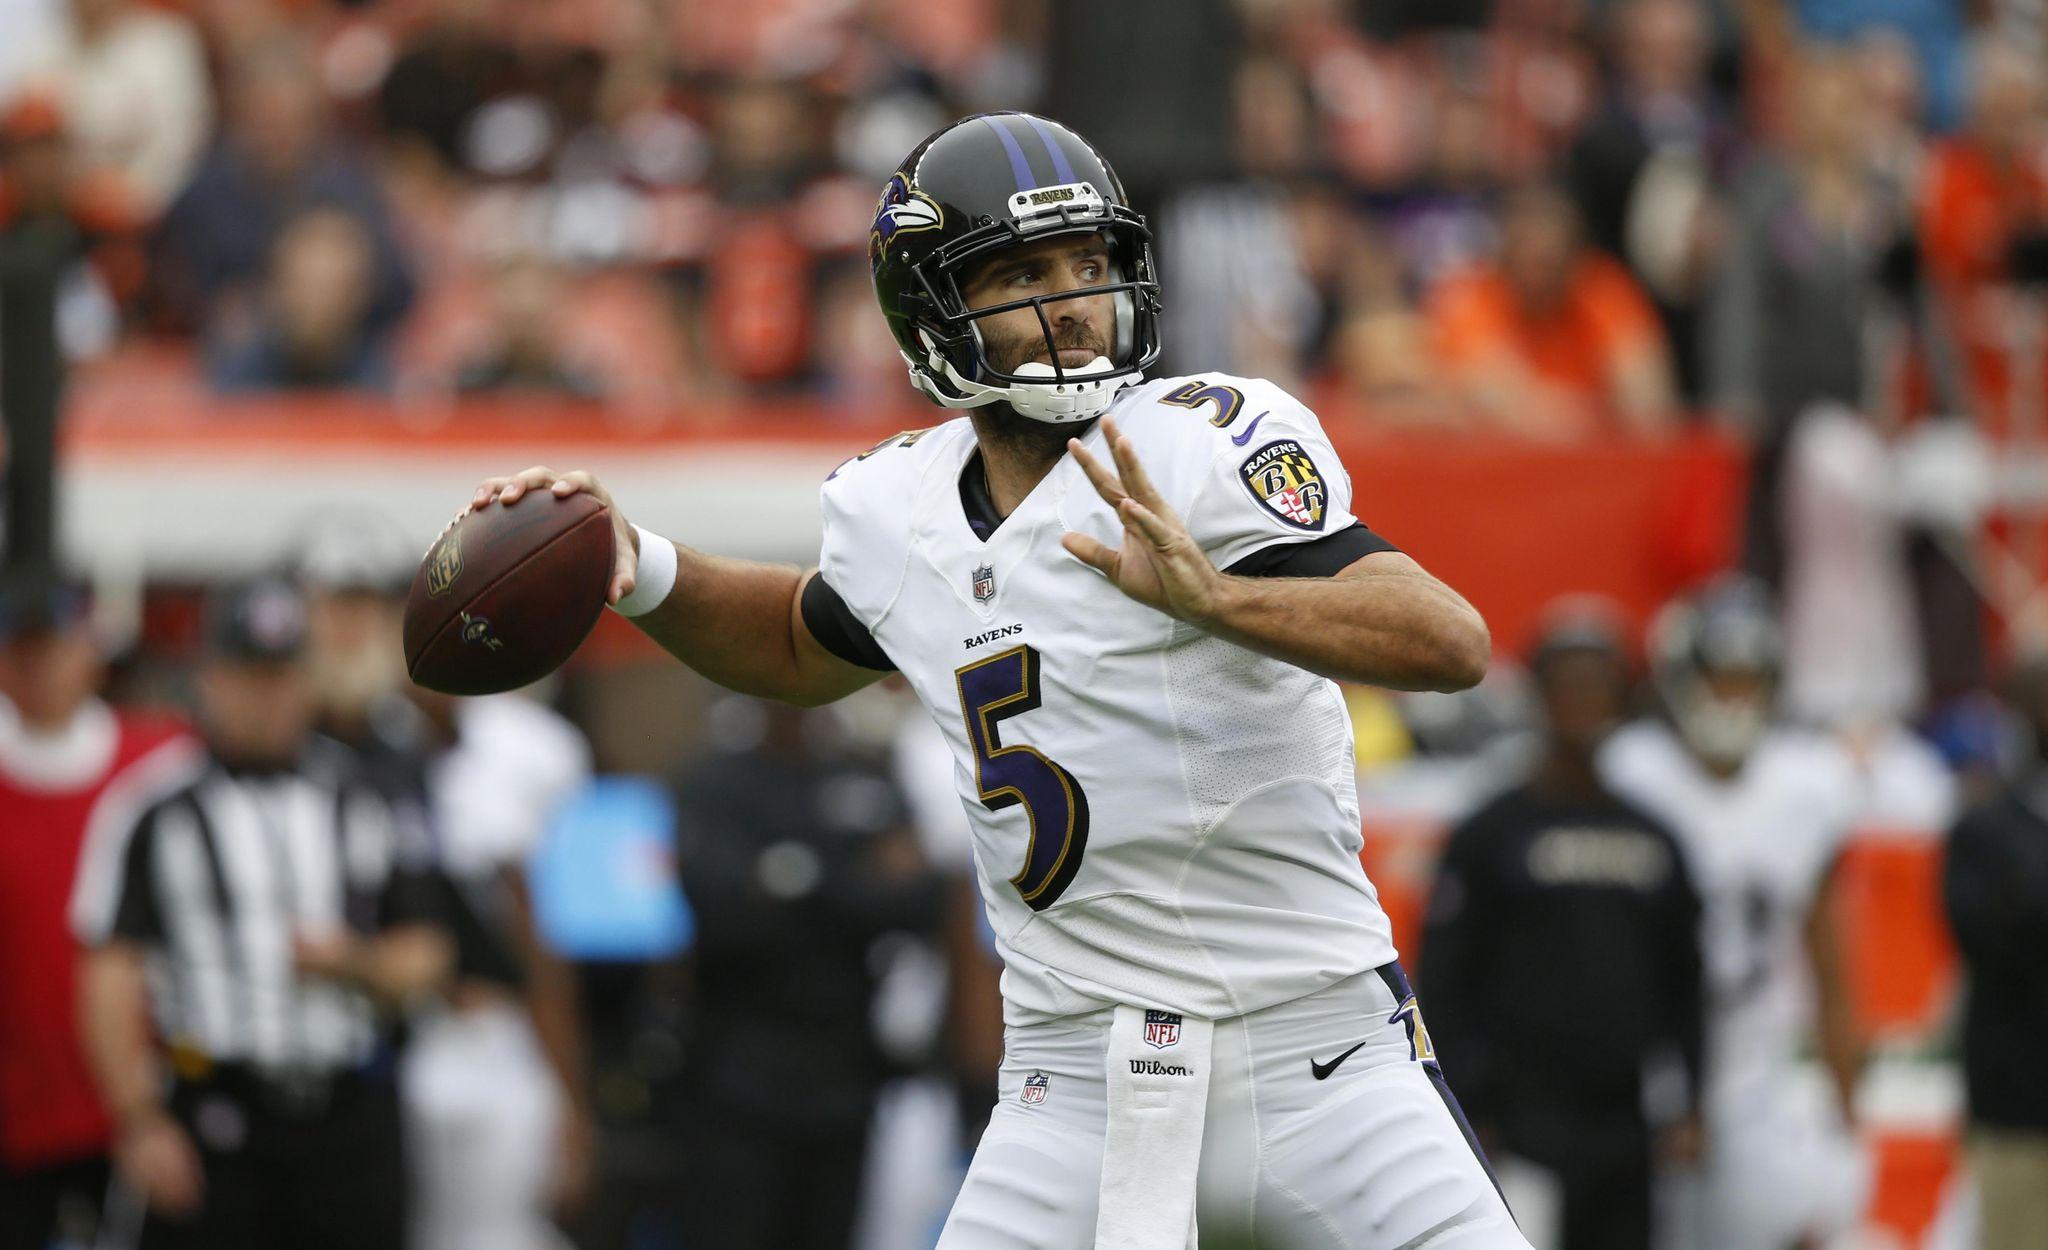 Ravens_broncos_trade_football_52570_s2048x1250